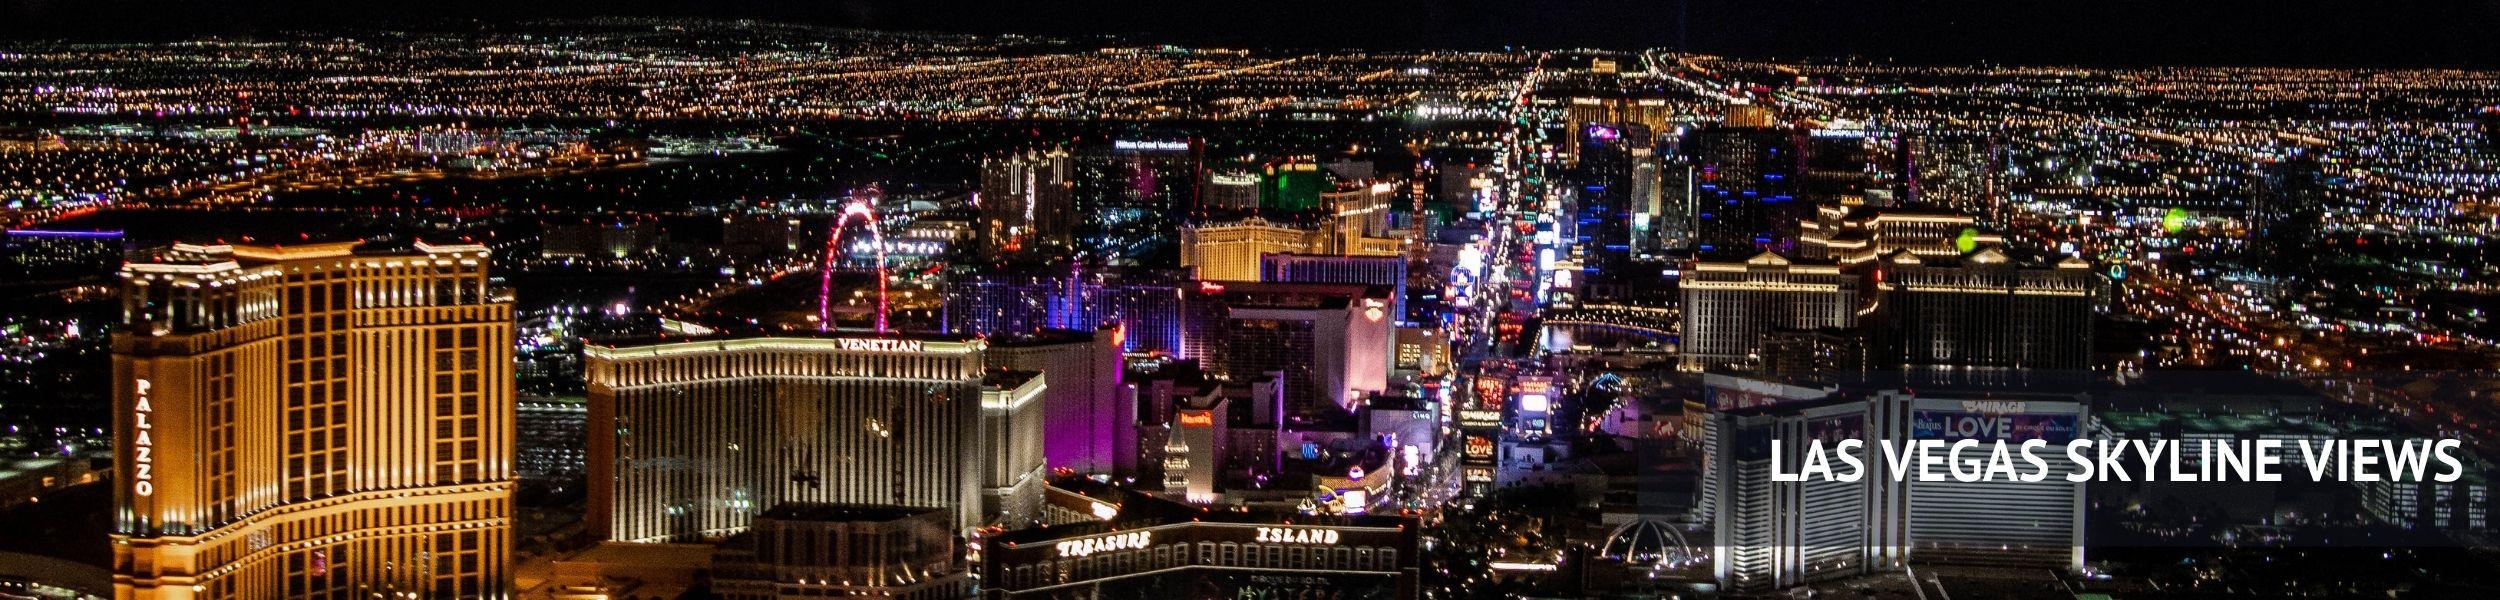 Best Views of the Las Vegas Skyline